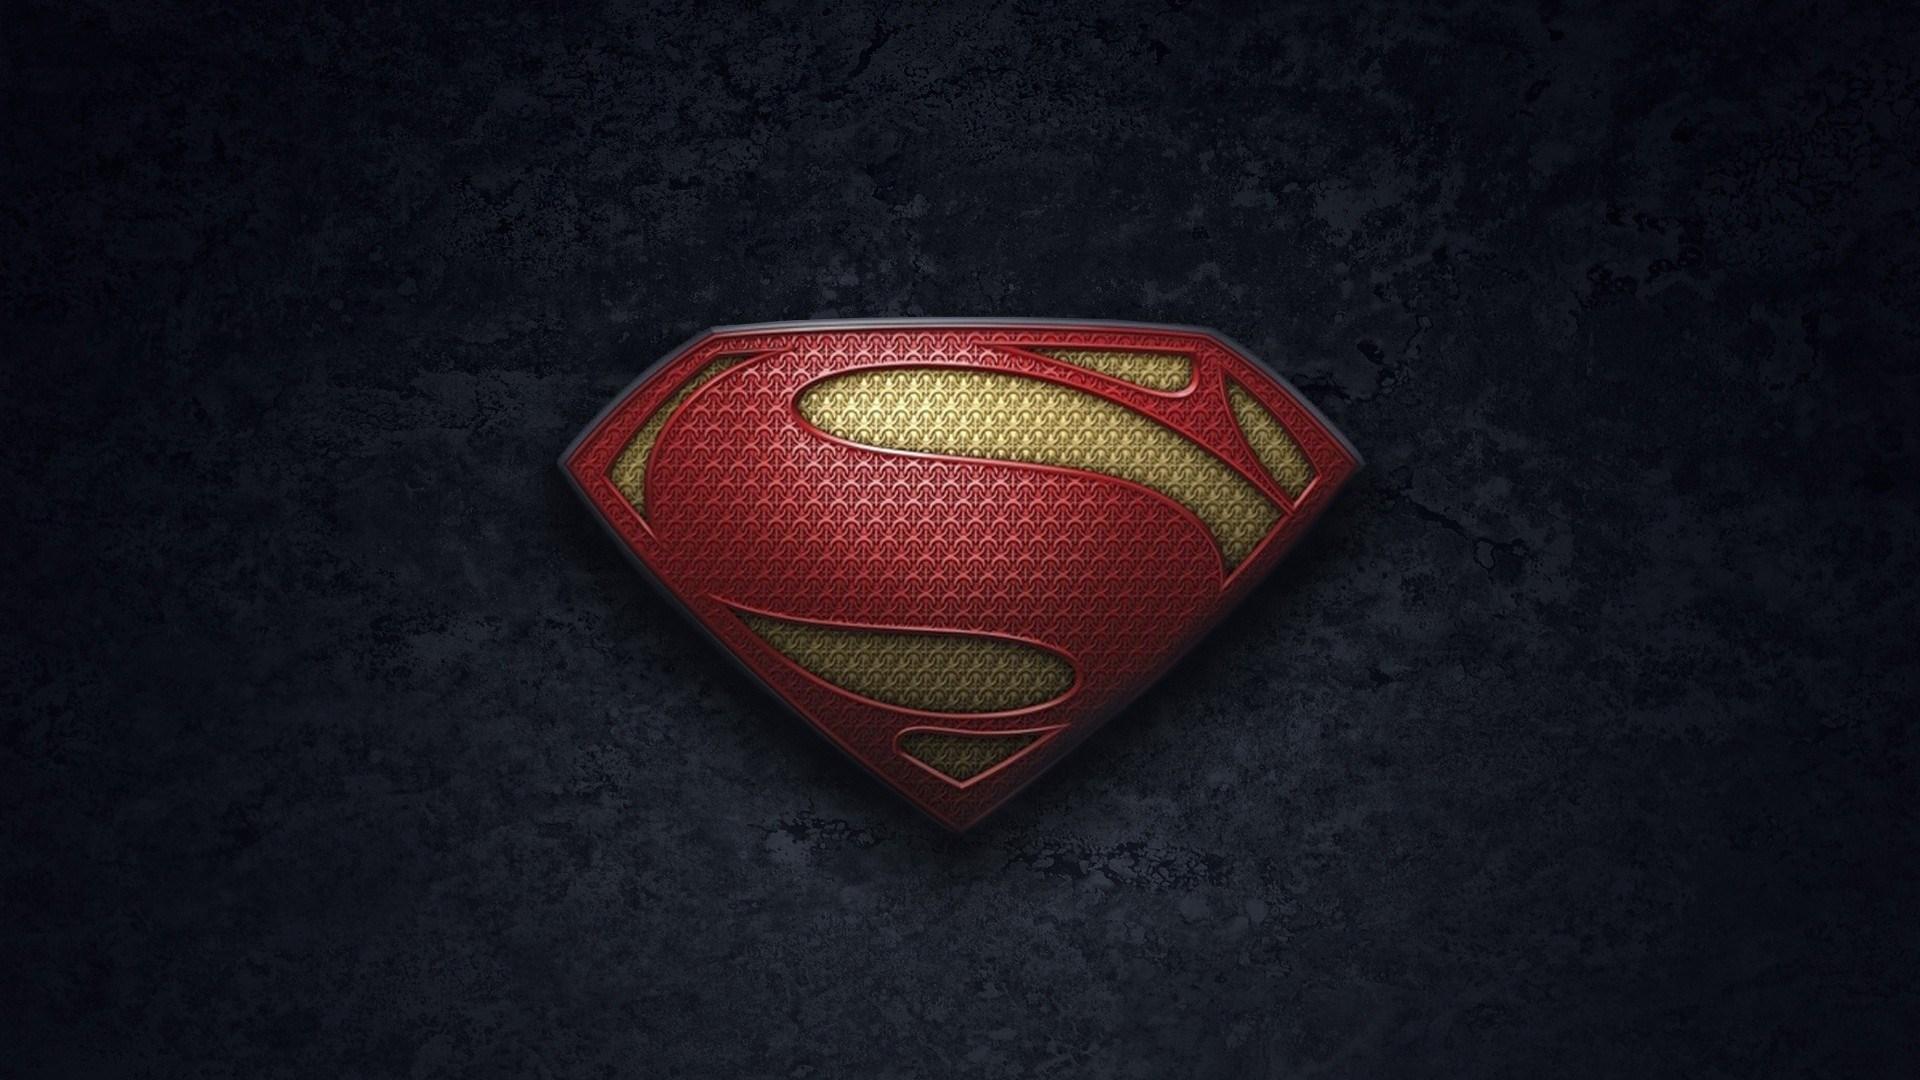 Superman full hd wallpaper and background image 1920x1080 id598191 movie man of steel superman movie superman logo wallpaper voltagebd Gallery